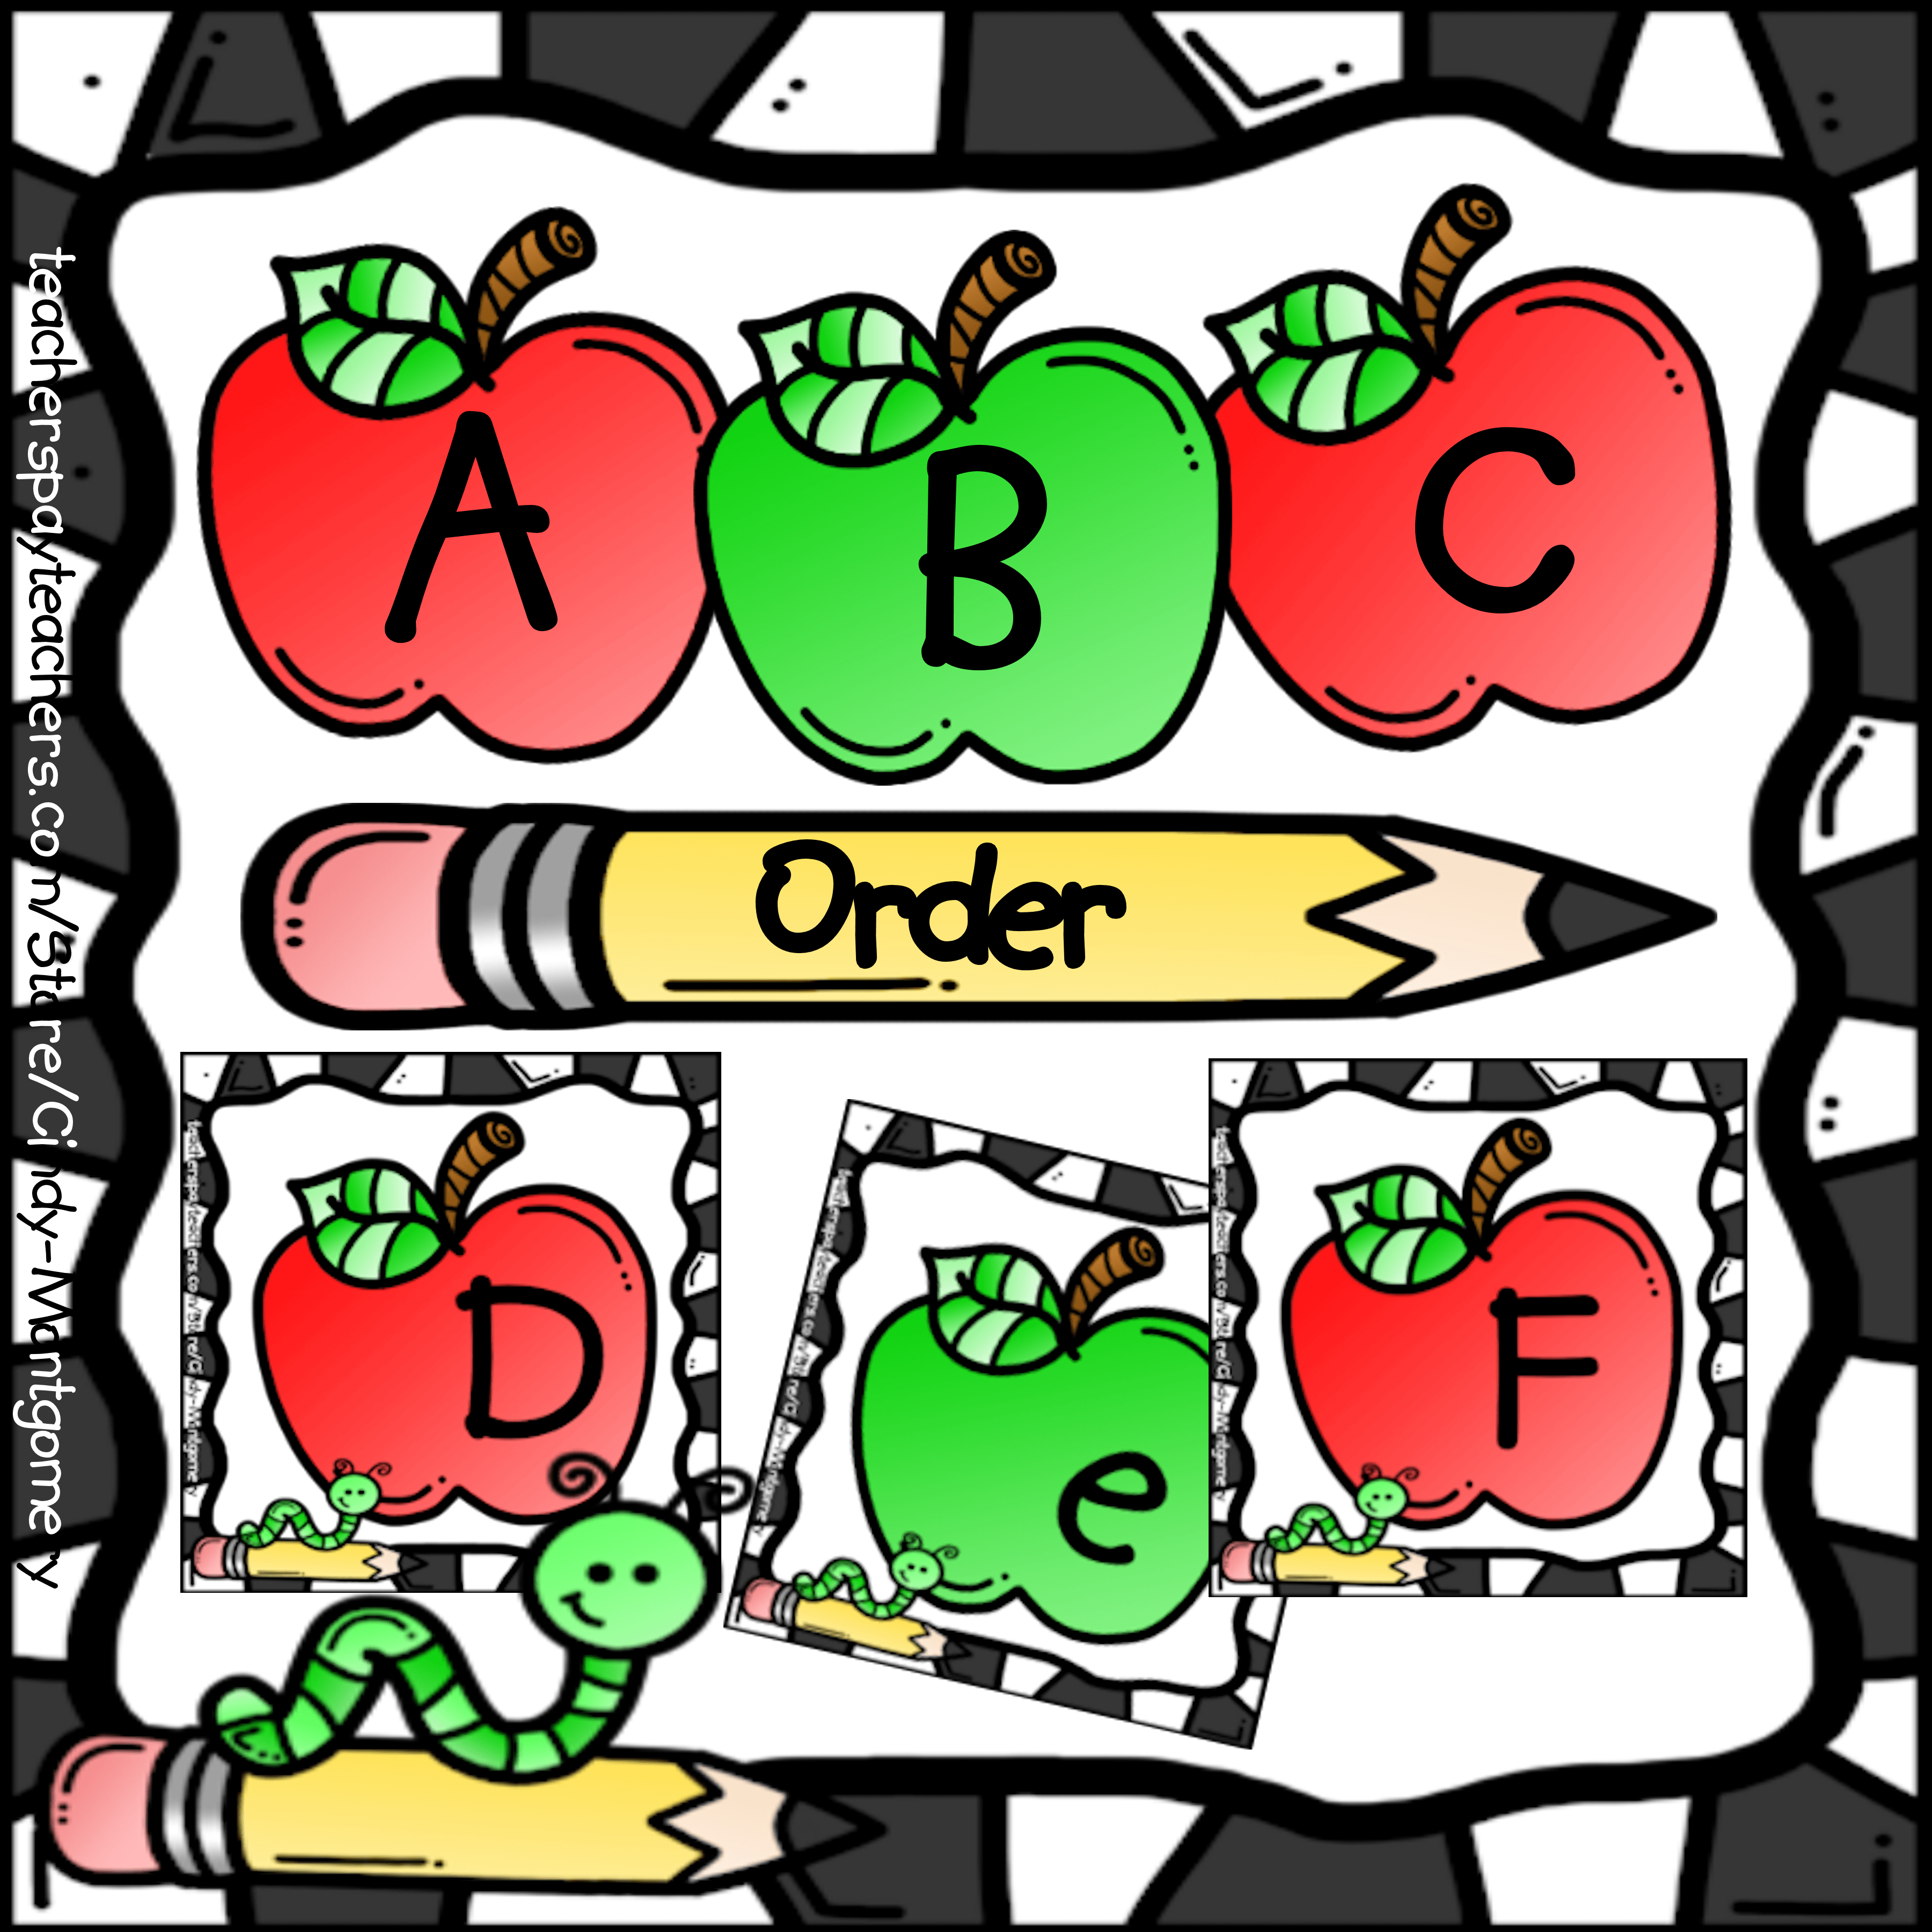 Apples Abc Order Printables Abc Order Abc Language Arts Resources [ 3600 x 3600 Pixel ]